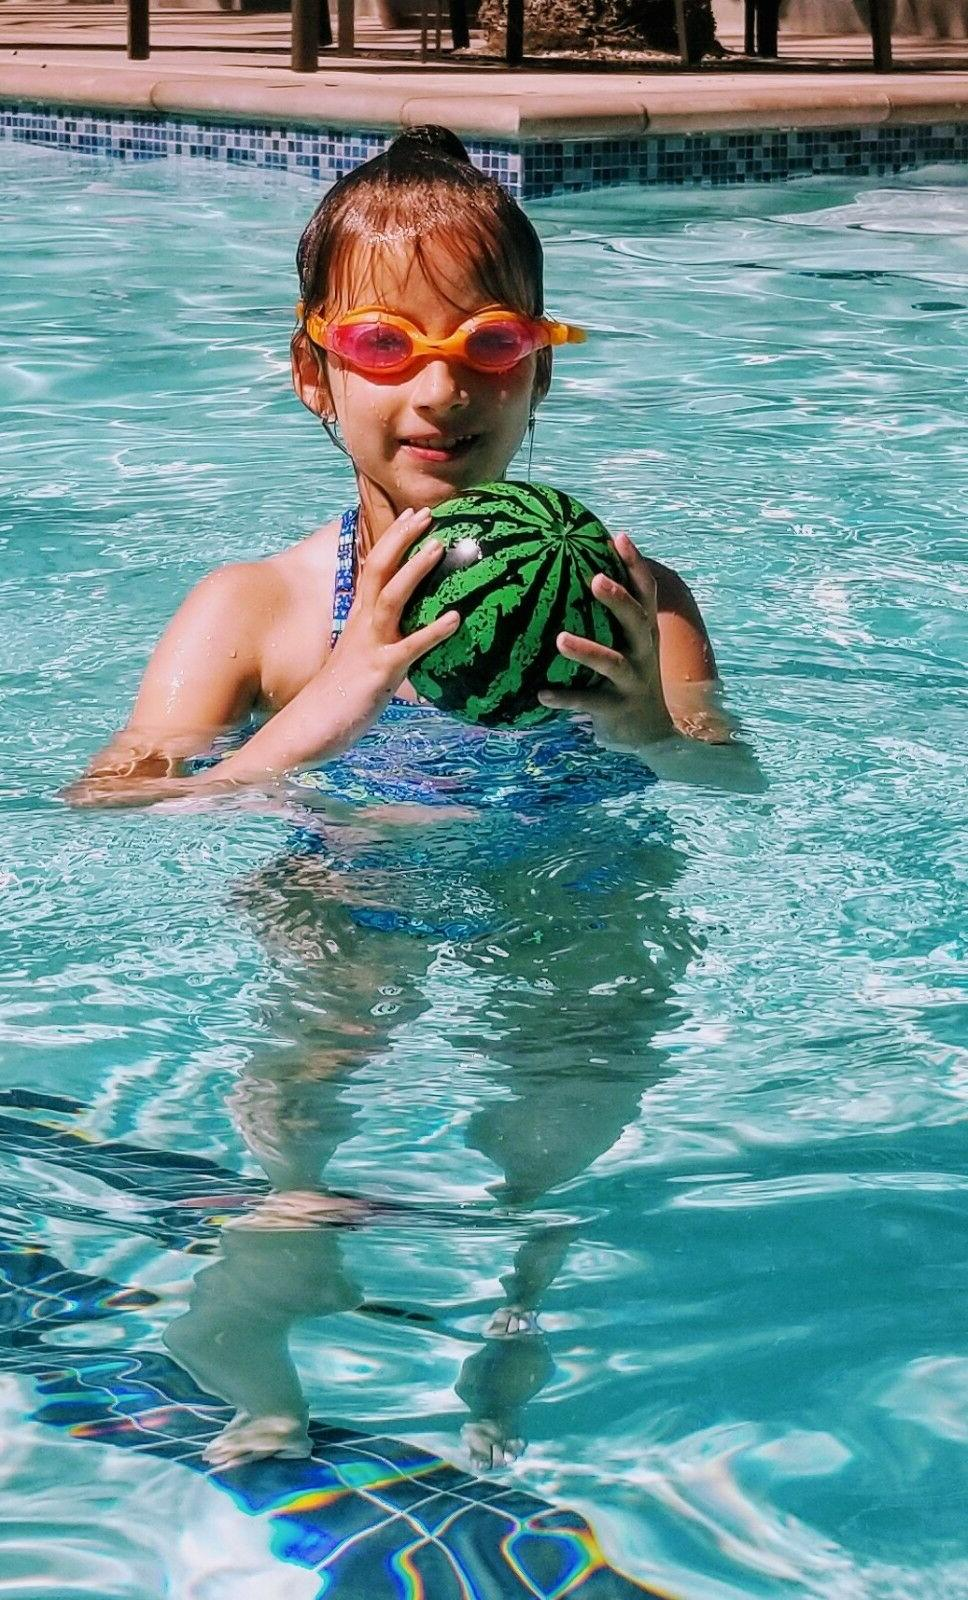 watermelon balls fun toys for the swimming